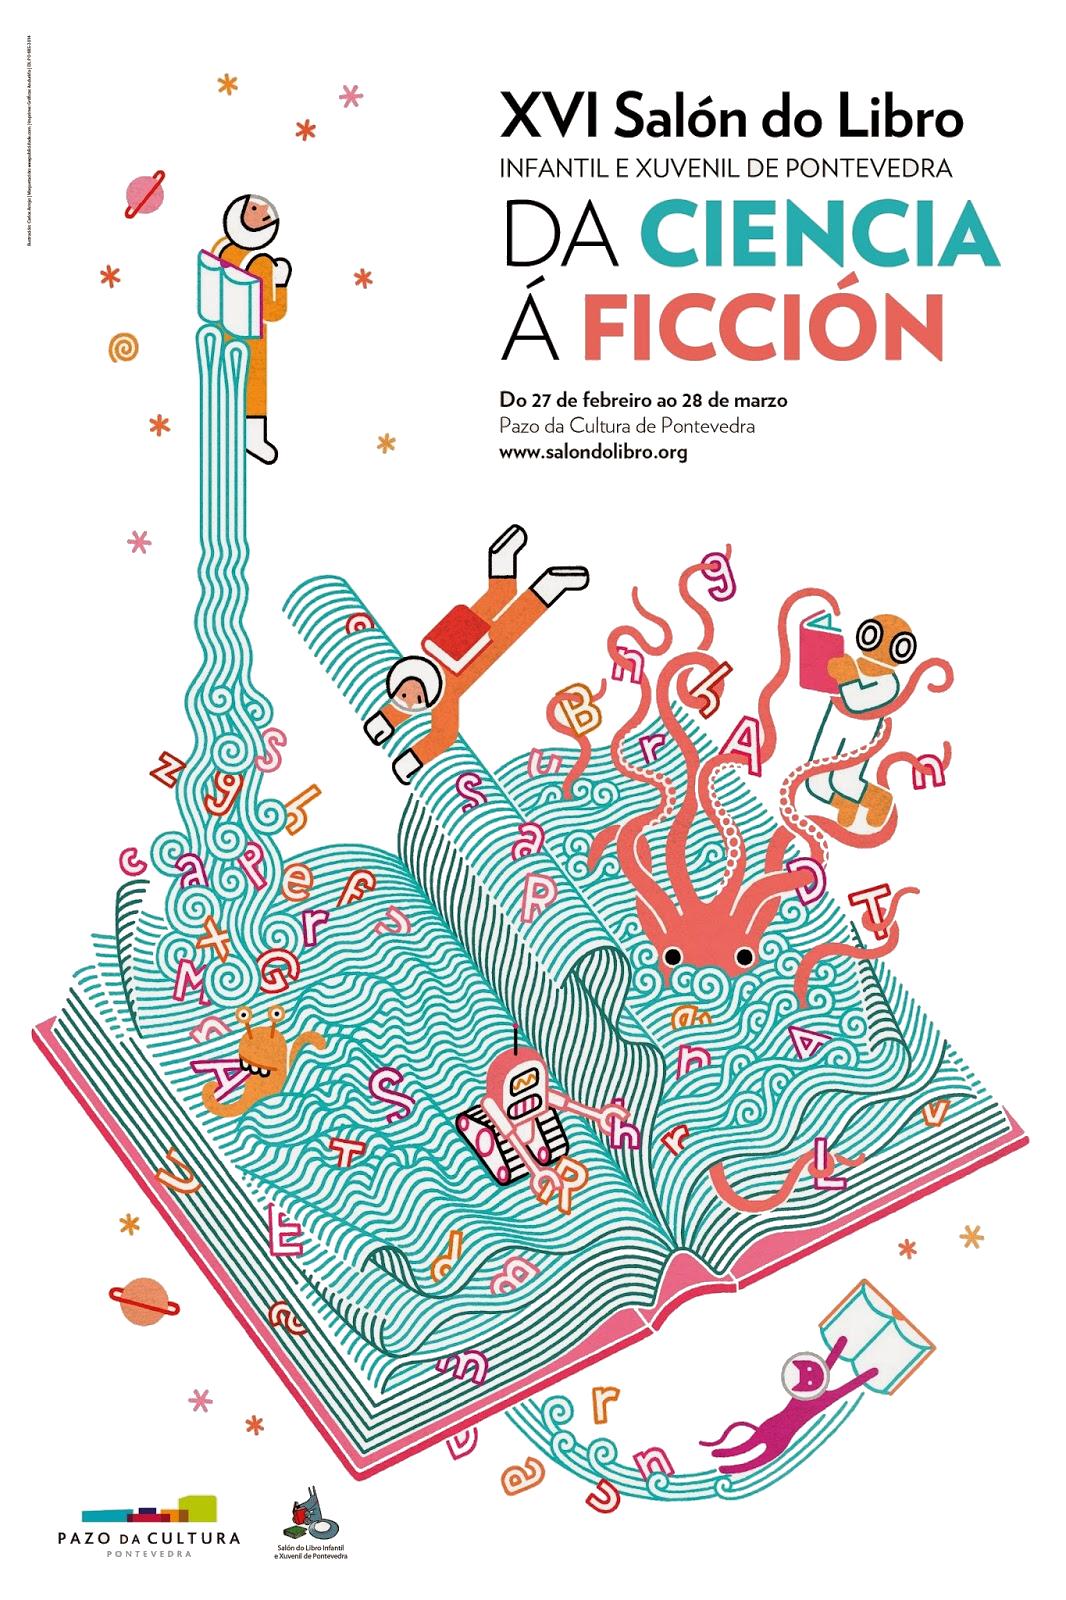 http://laguiaplisplas.blogspot.com.es/2015/02/xvi-salondel-libro-infantil-y-juvenil.html